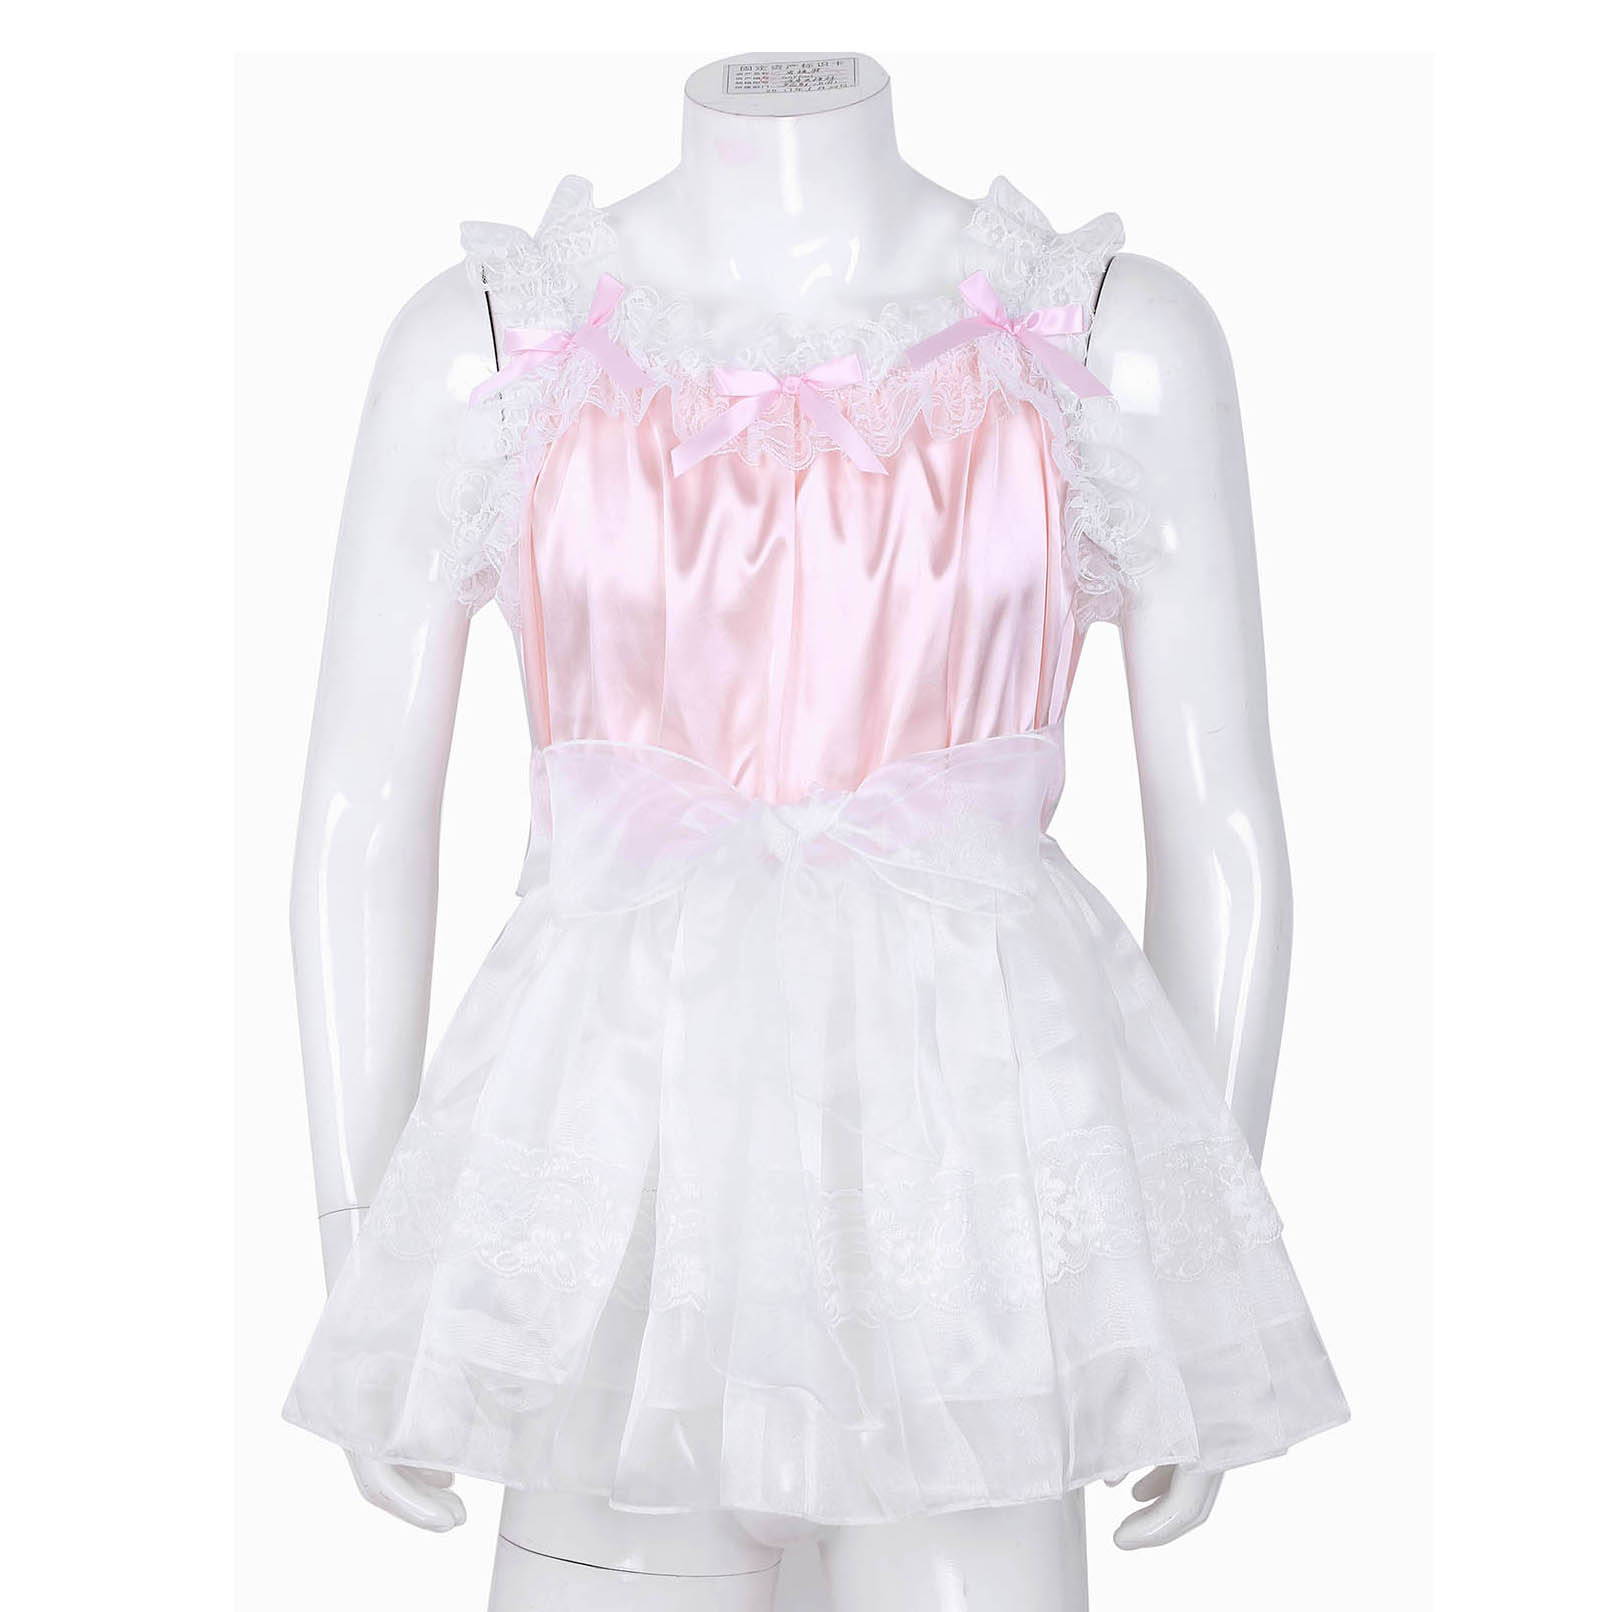 Adult Mens Sissy Babydoll Crossdress Ruffled Lace Tulle Dress Gay Male Clubwear